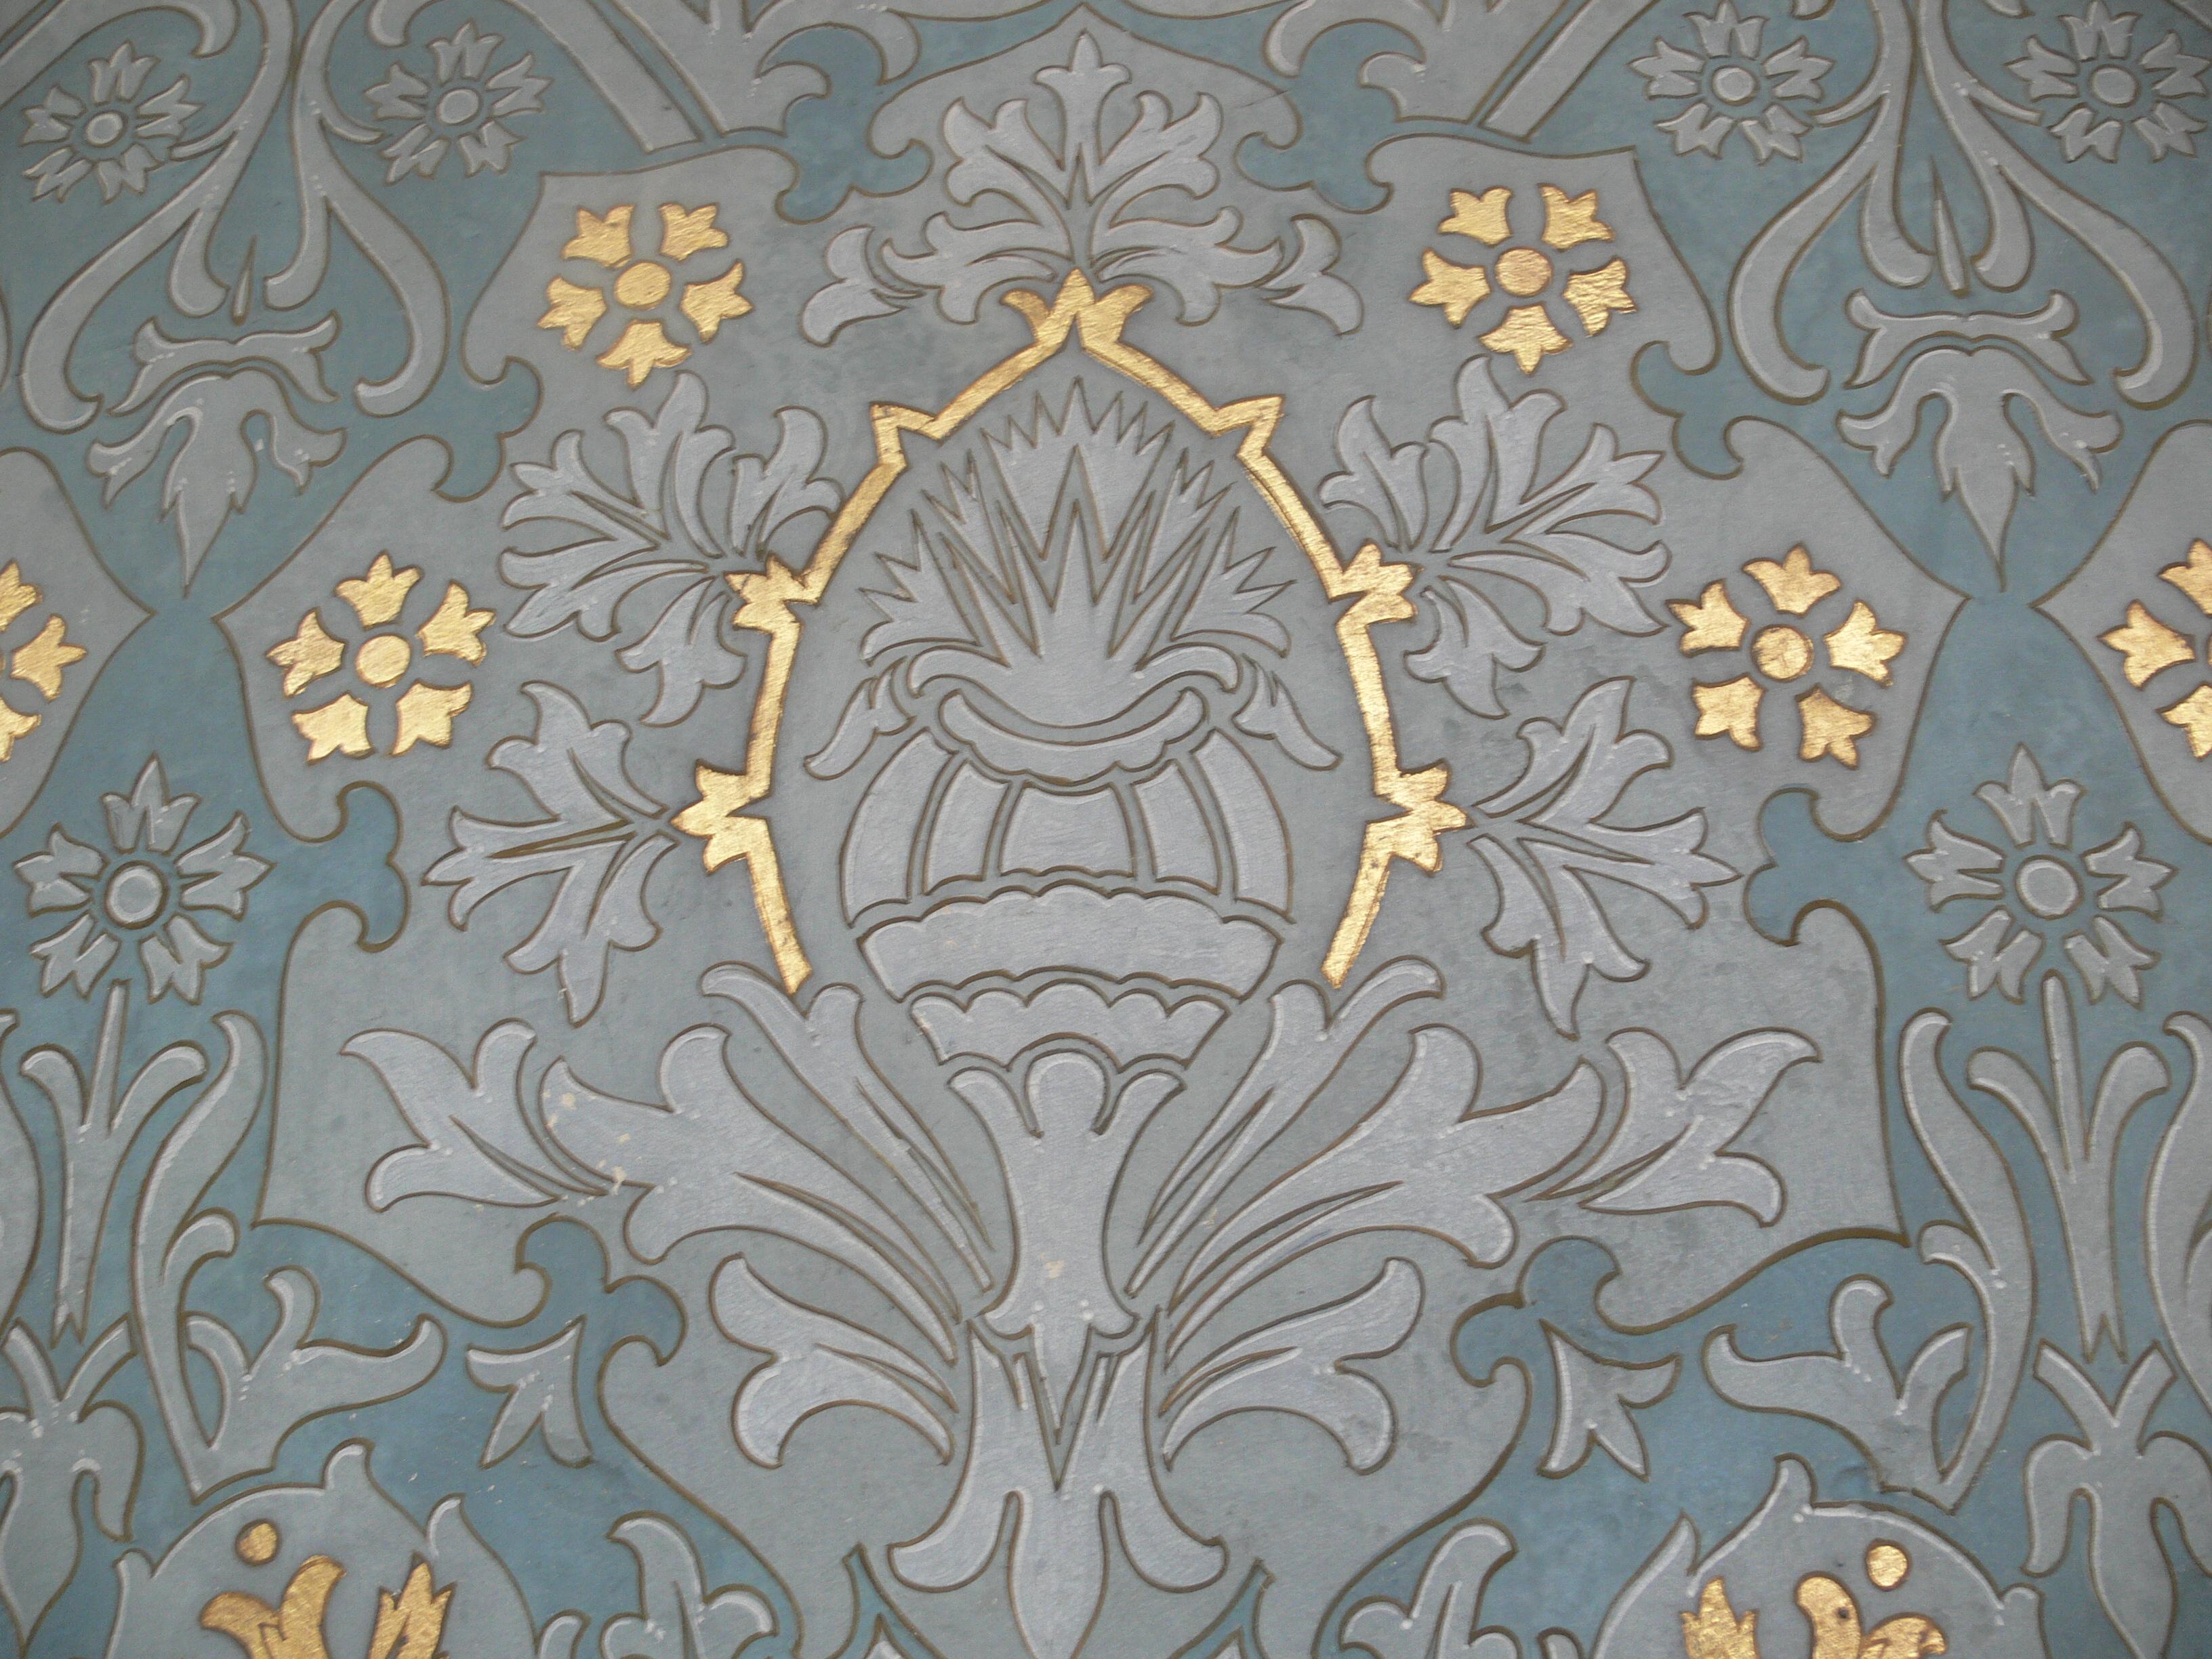 File:Pfarrkirche Weitnau Wandbemalung Detail